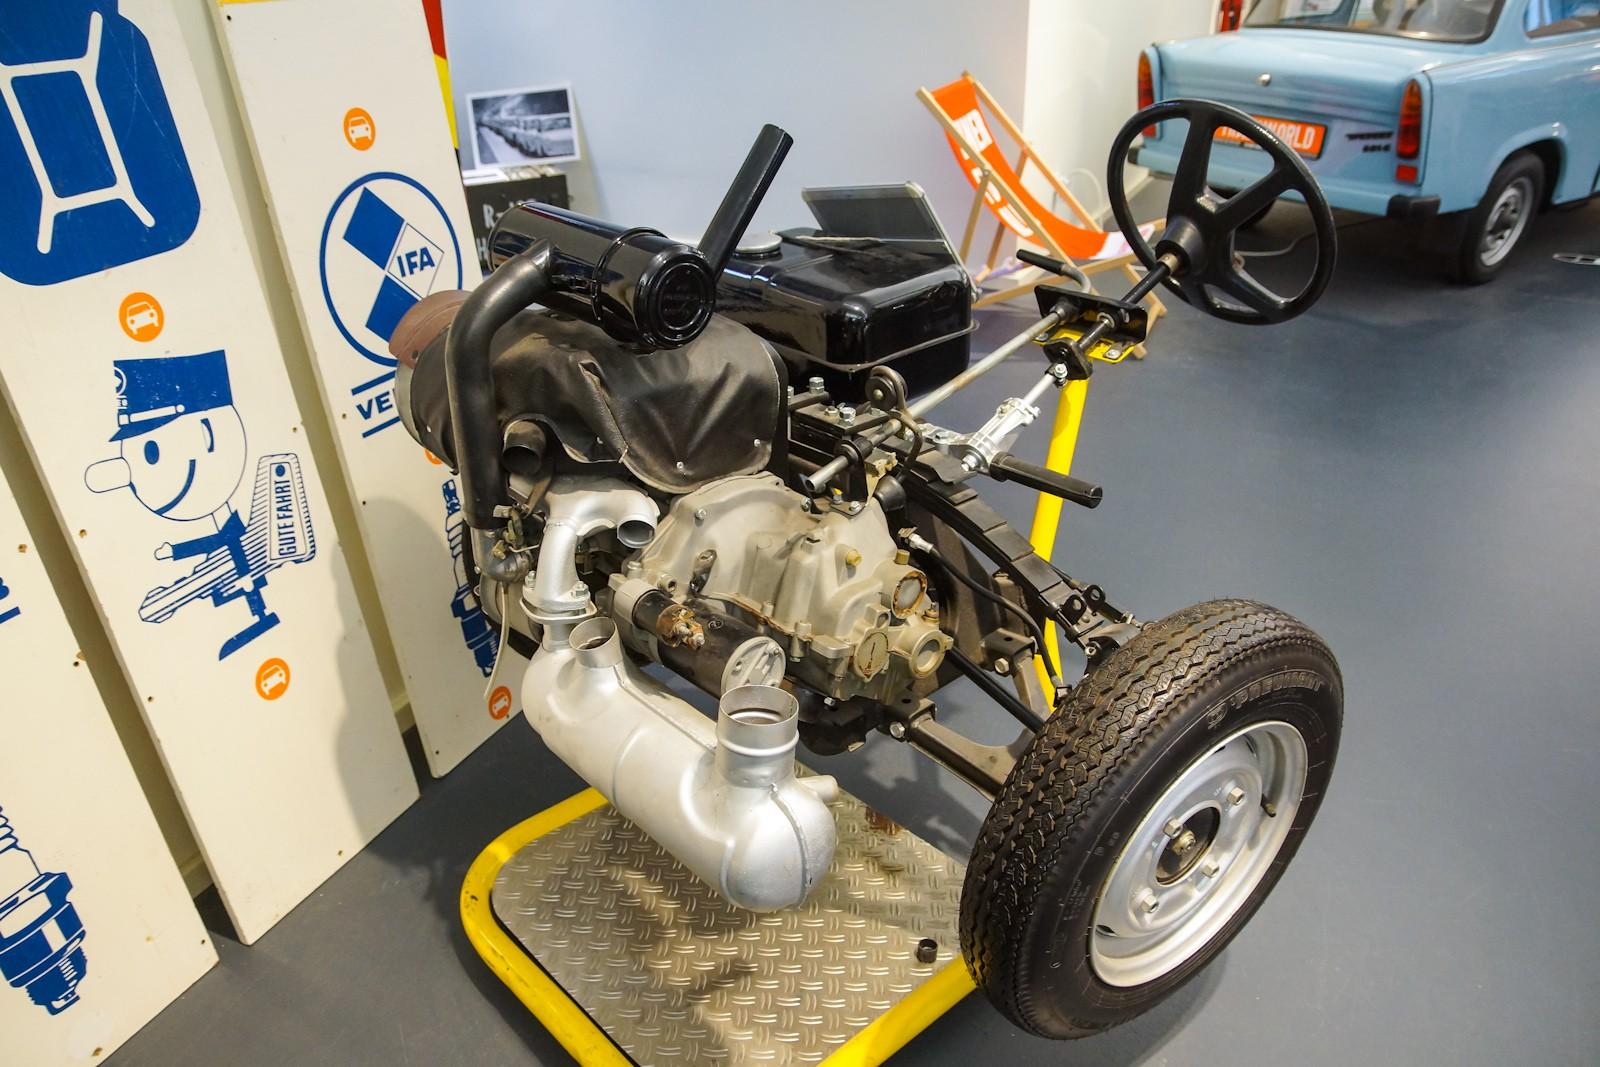 0 trabant 601 engine and transmission museum exhibit. Black Bedroom Furniture Sets. Home Design Ideas